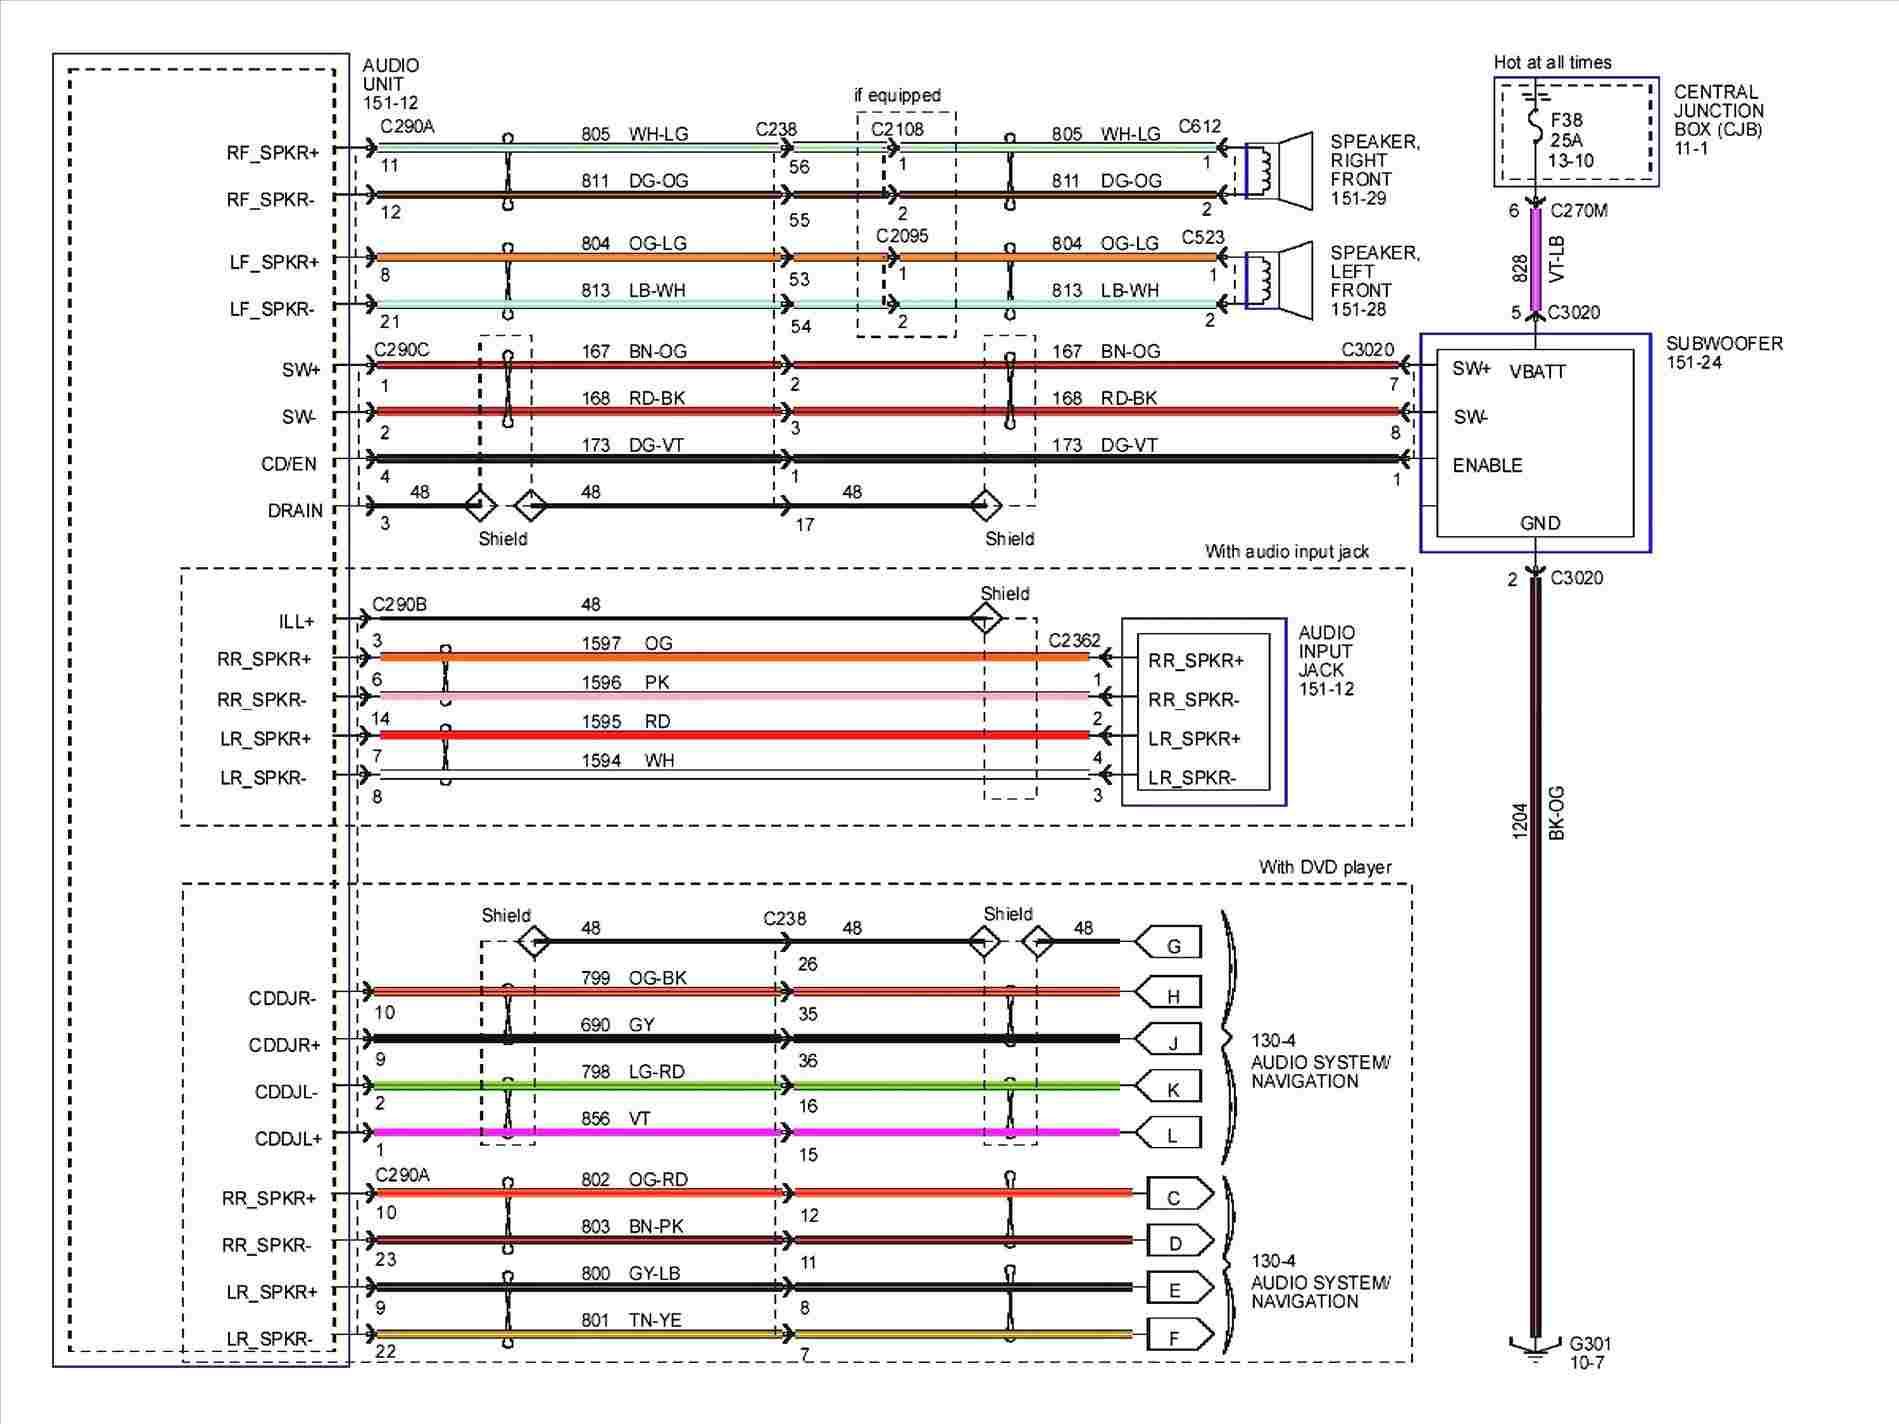 Unique-Wire-Harness-Rhkmestccom-Pioneer-Fh-X720Bt-Wiring-Xbt-Diagram - Pioneer Fh X720Bt Wiring Diagram